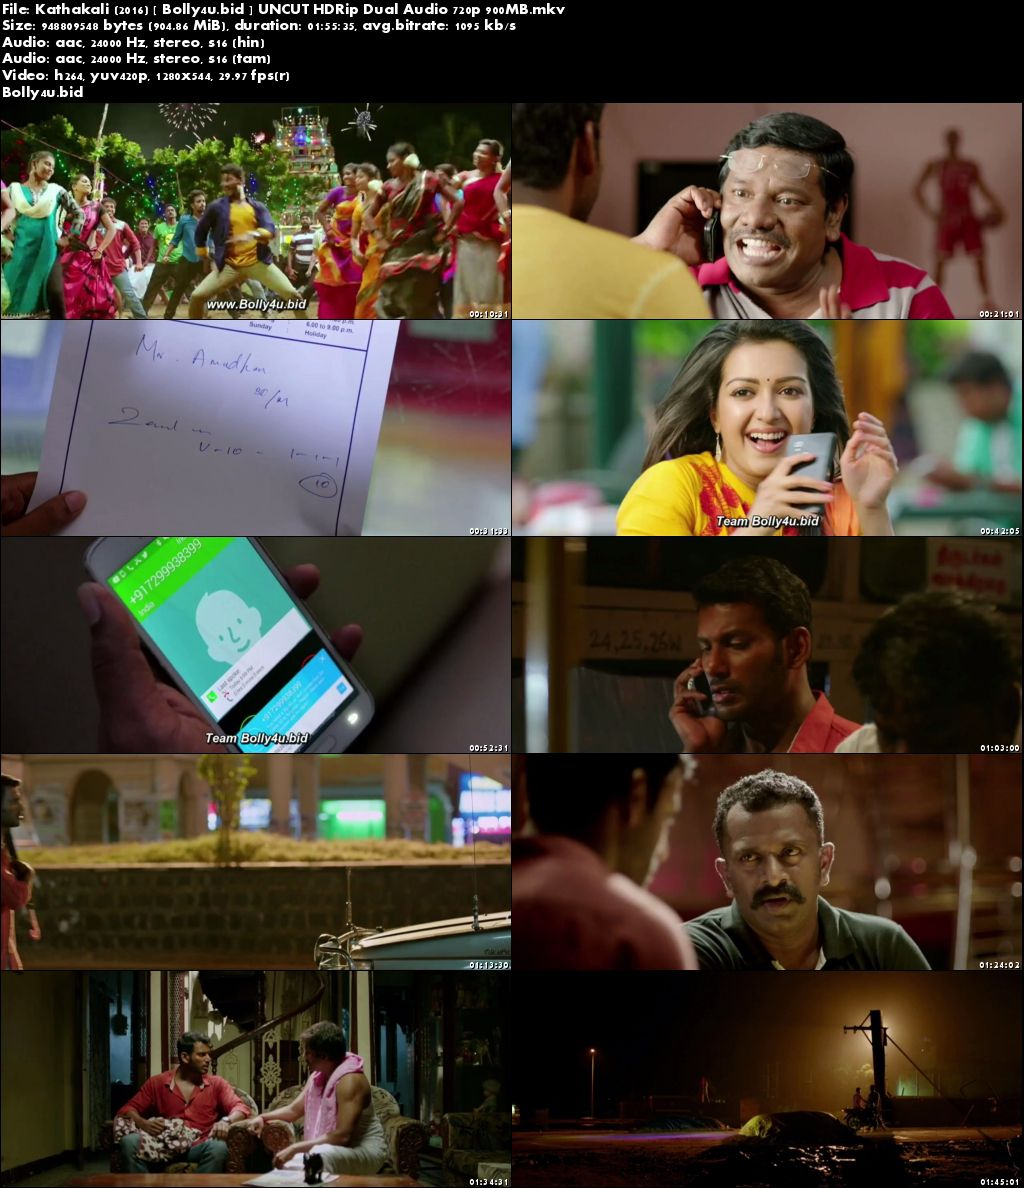 Kathakali 2016 HDRip 900MB UNCUT Hindi Dual Audio 720p Download